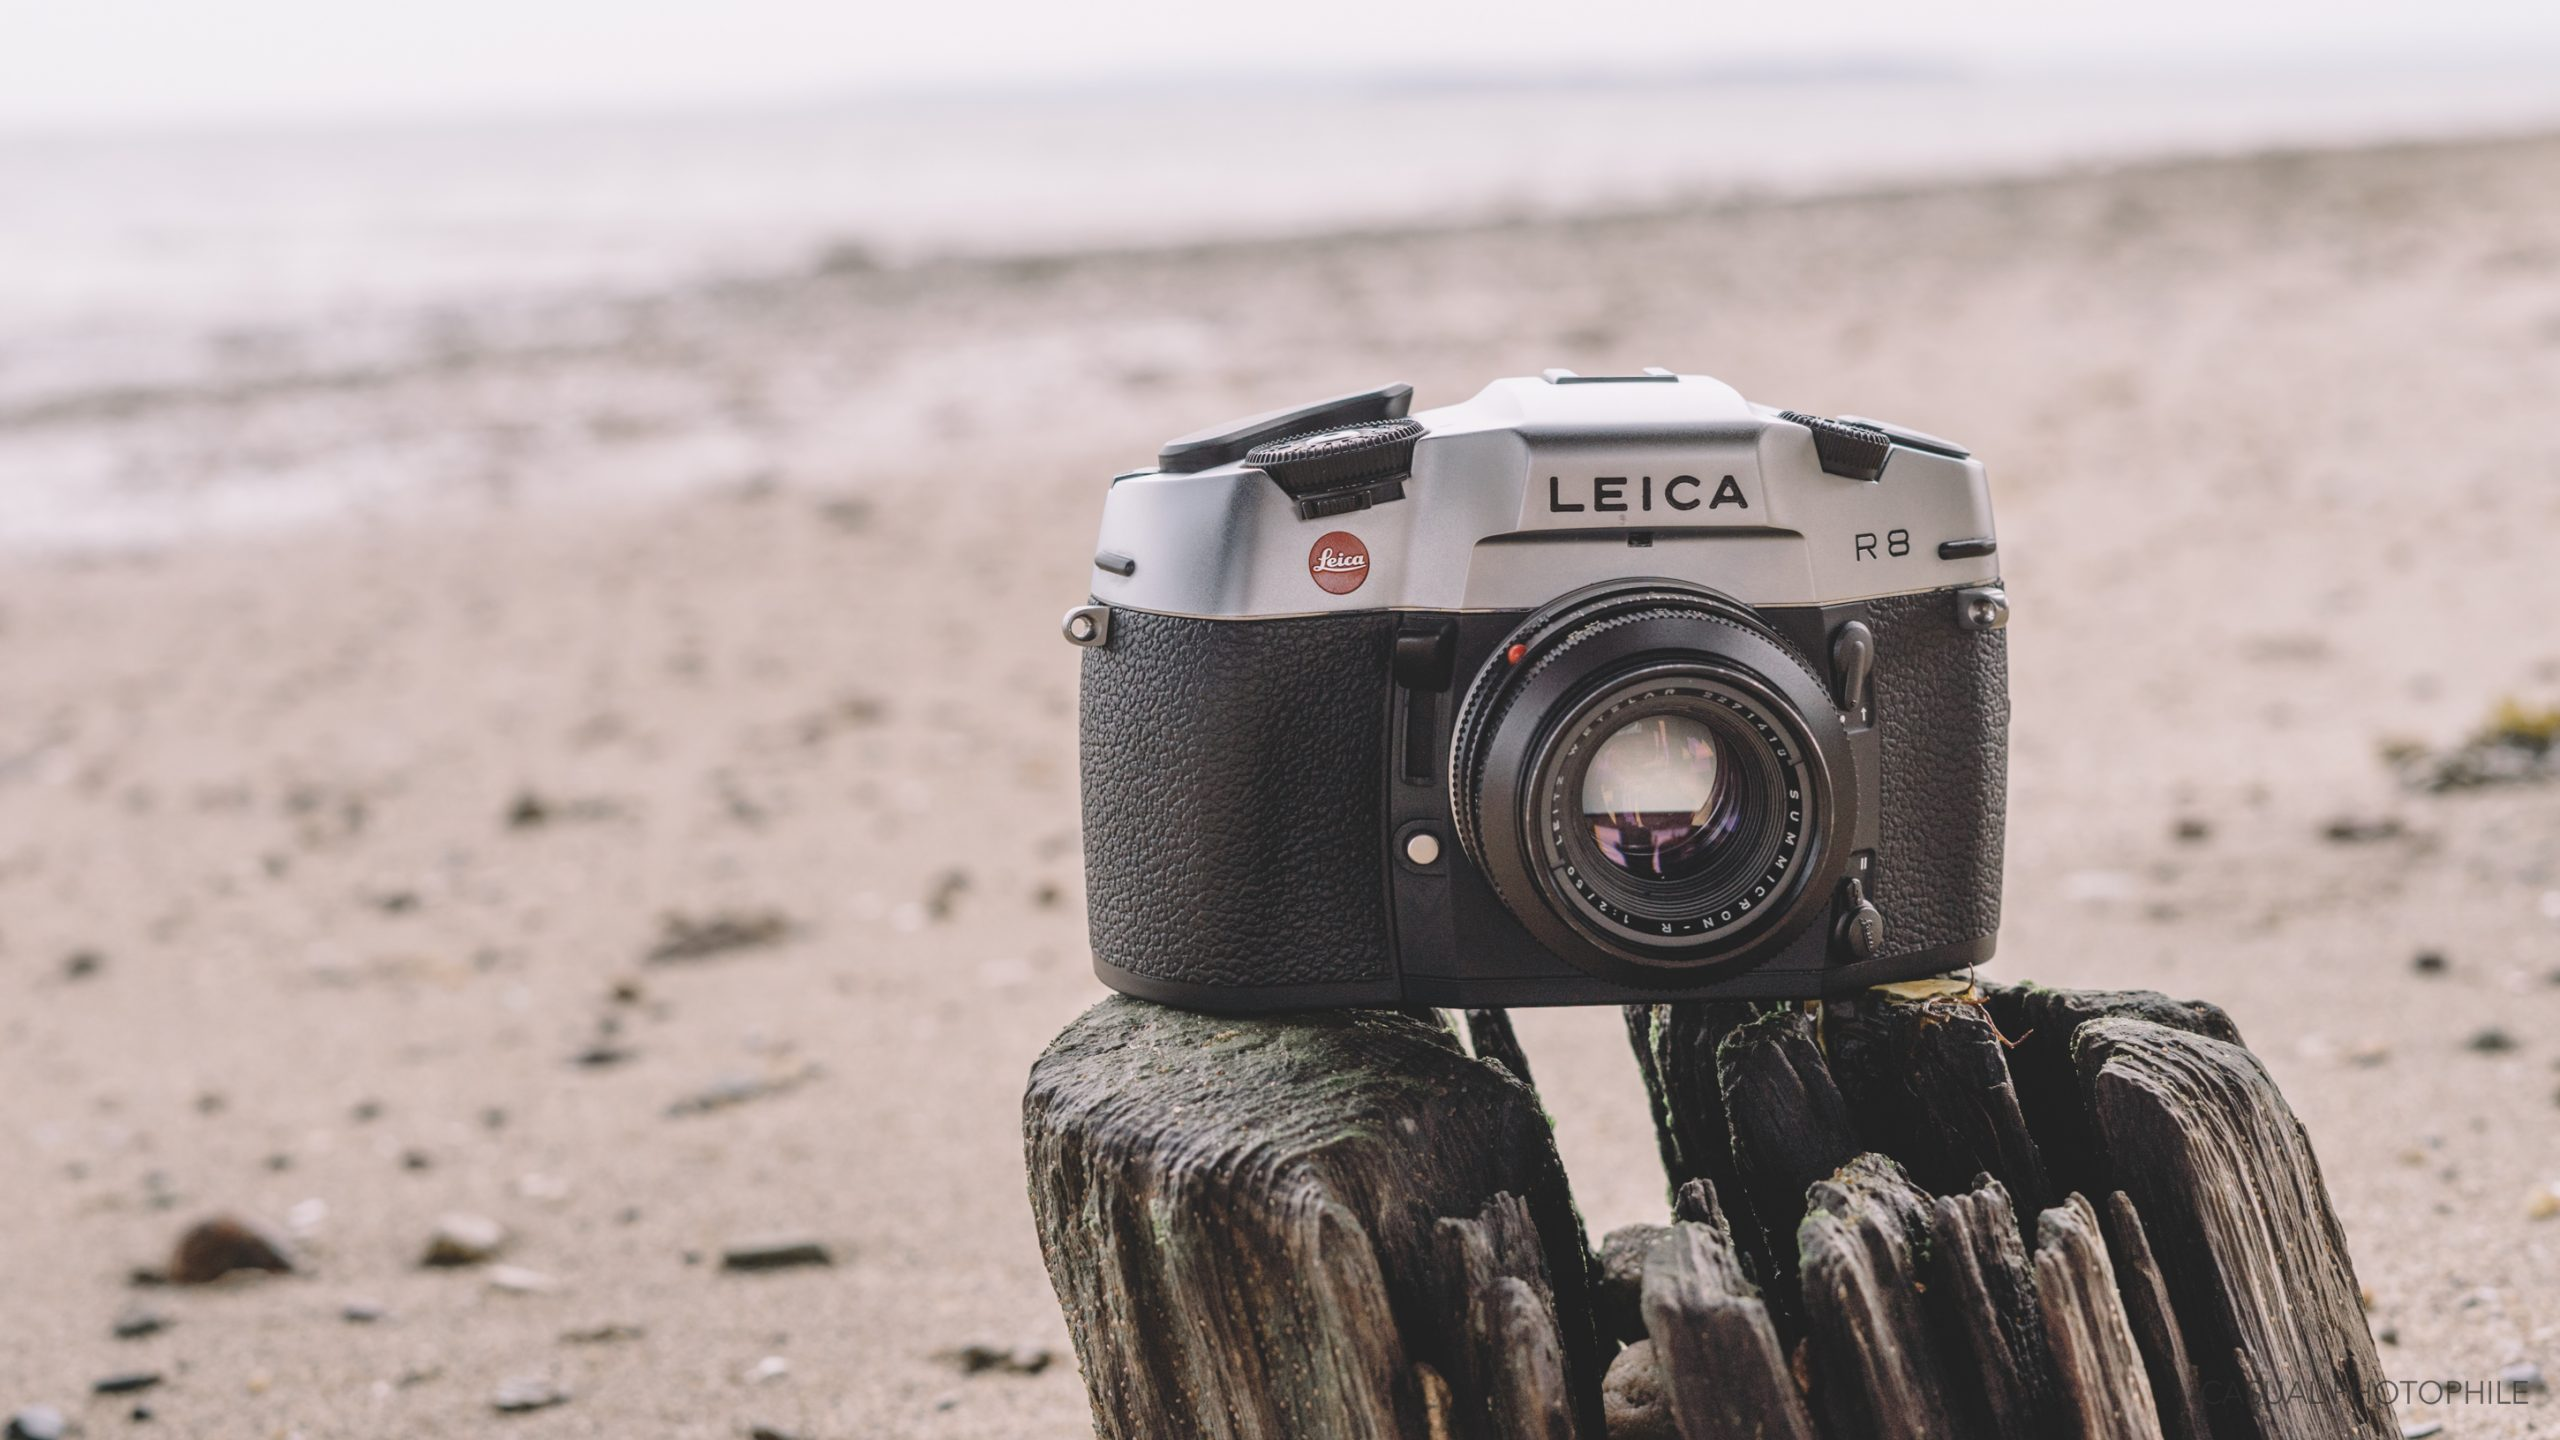 Leica R8 Review Leica S Most Advanced Film Camera